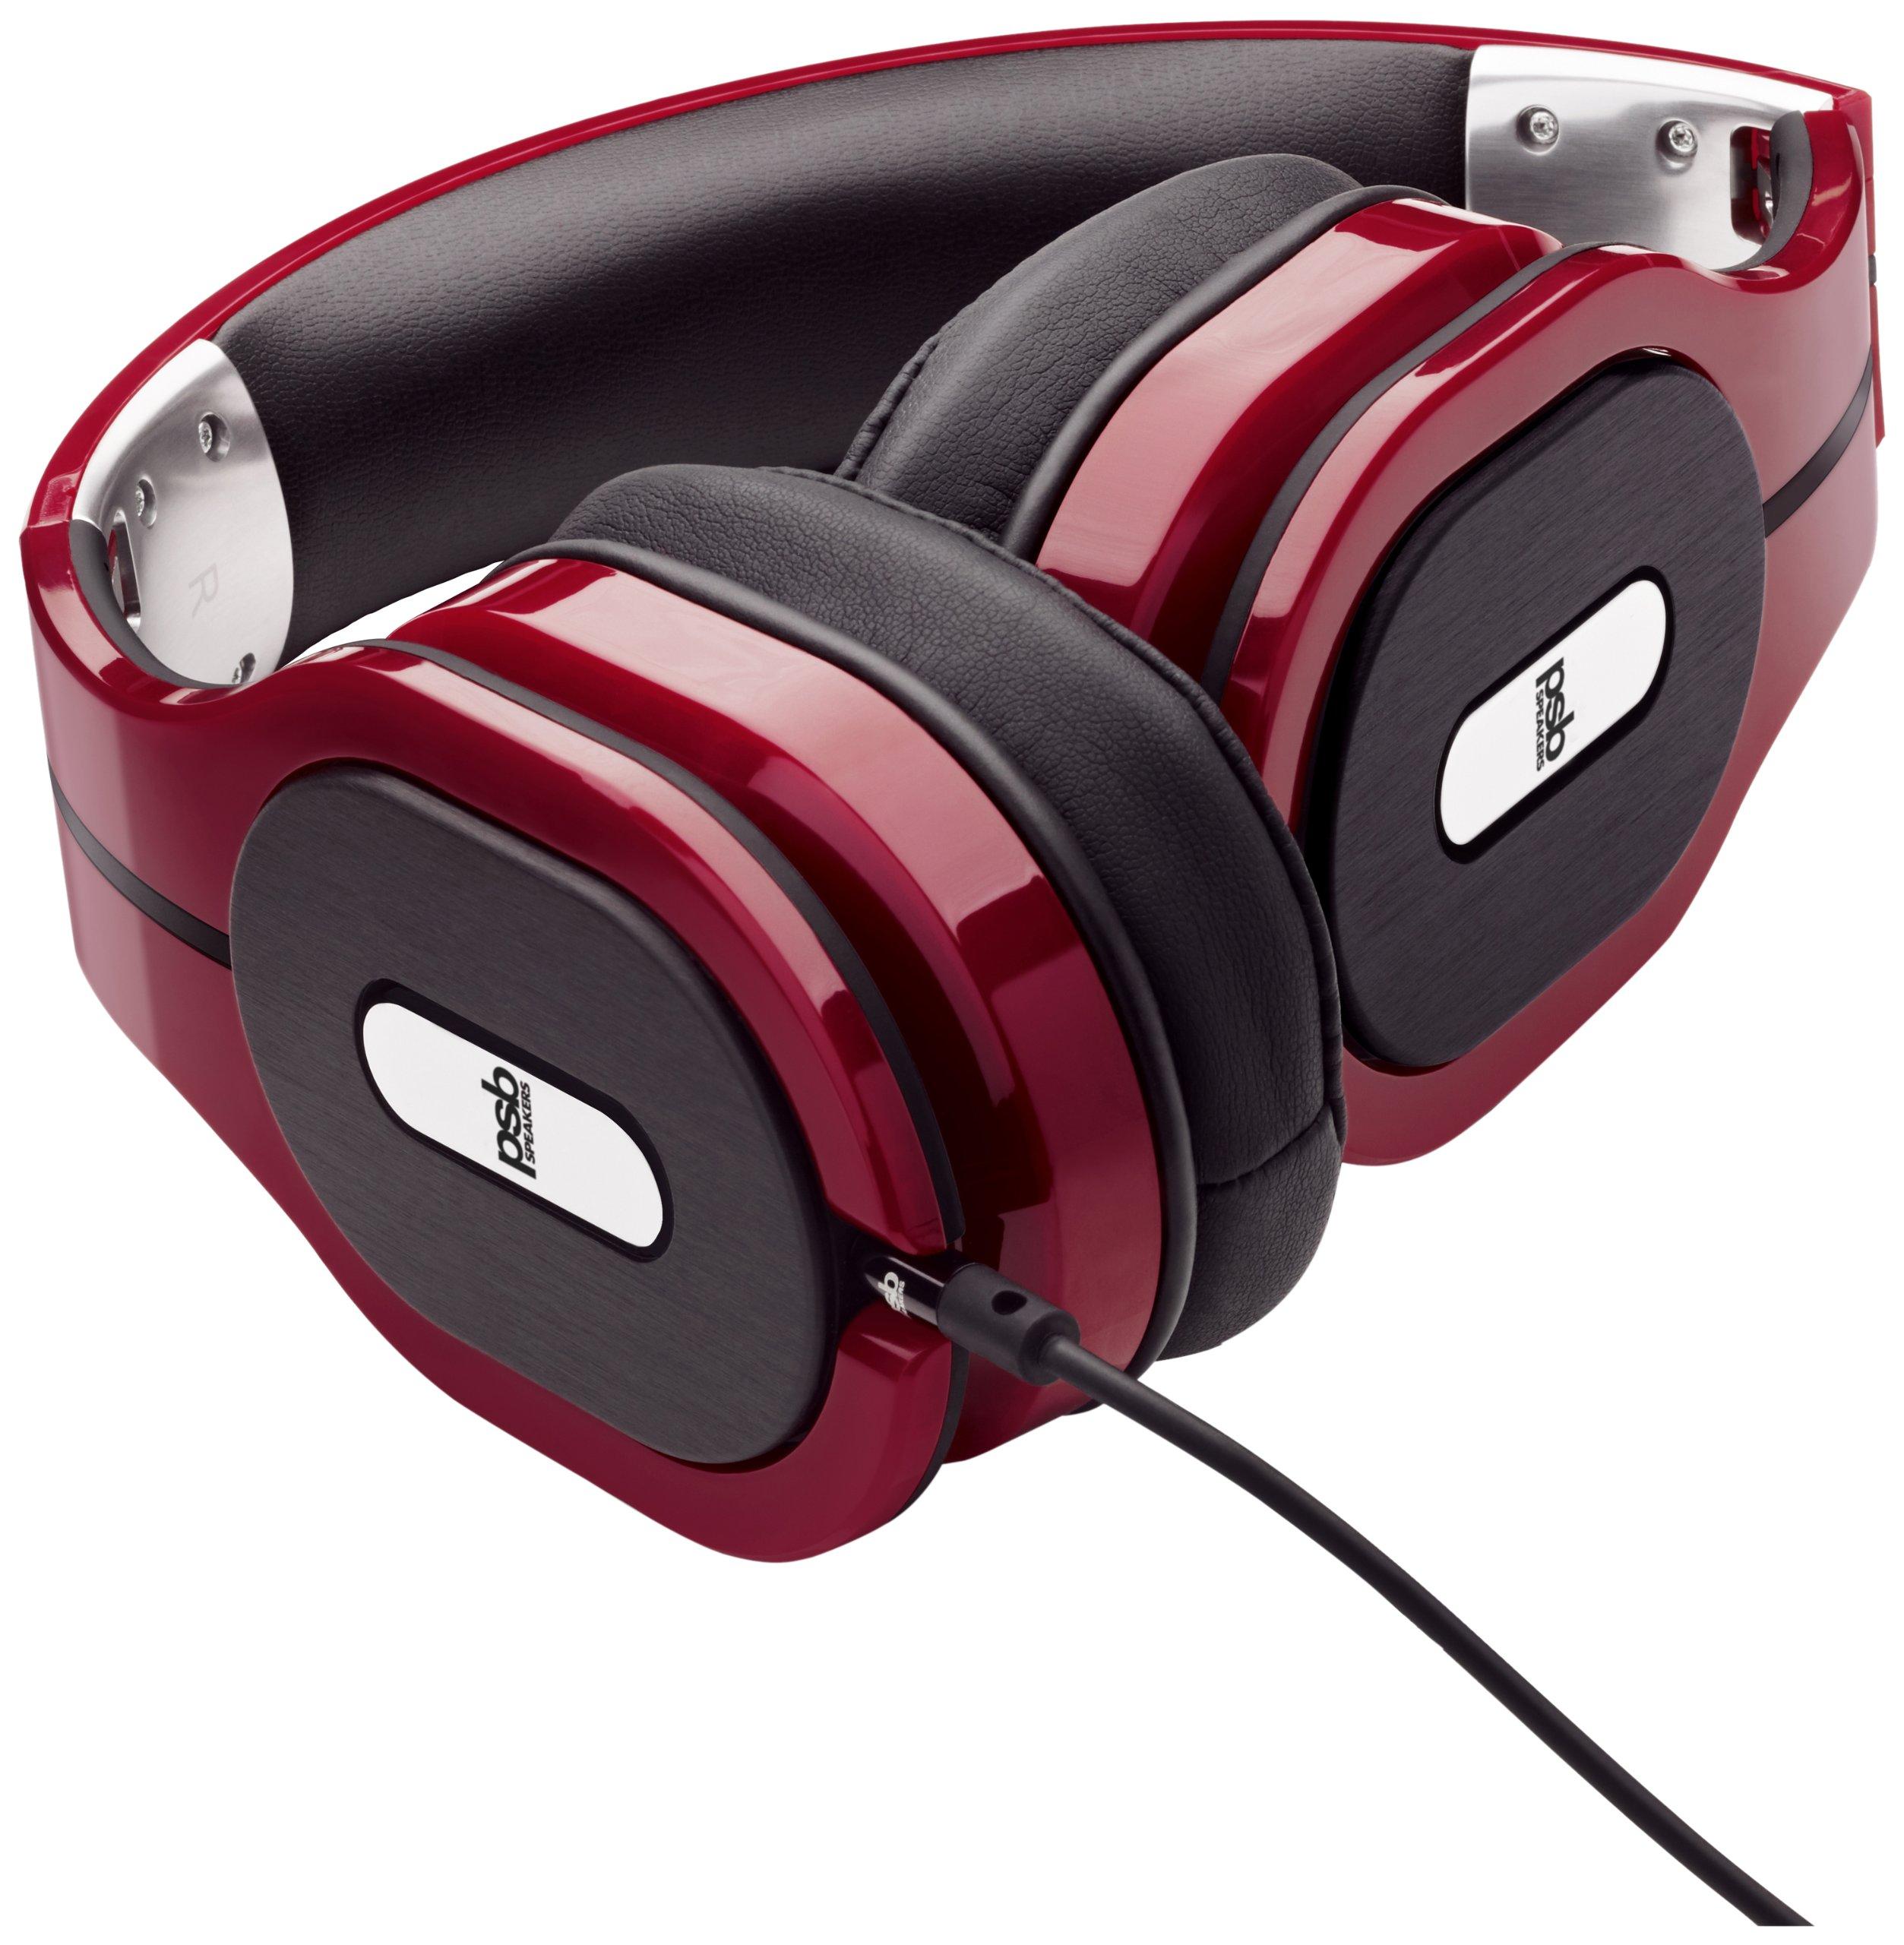 PSB M4U-1 RED M4U 1 High Performance Over-Ear Headphones Red